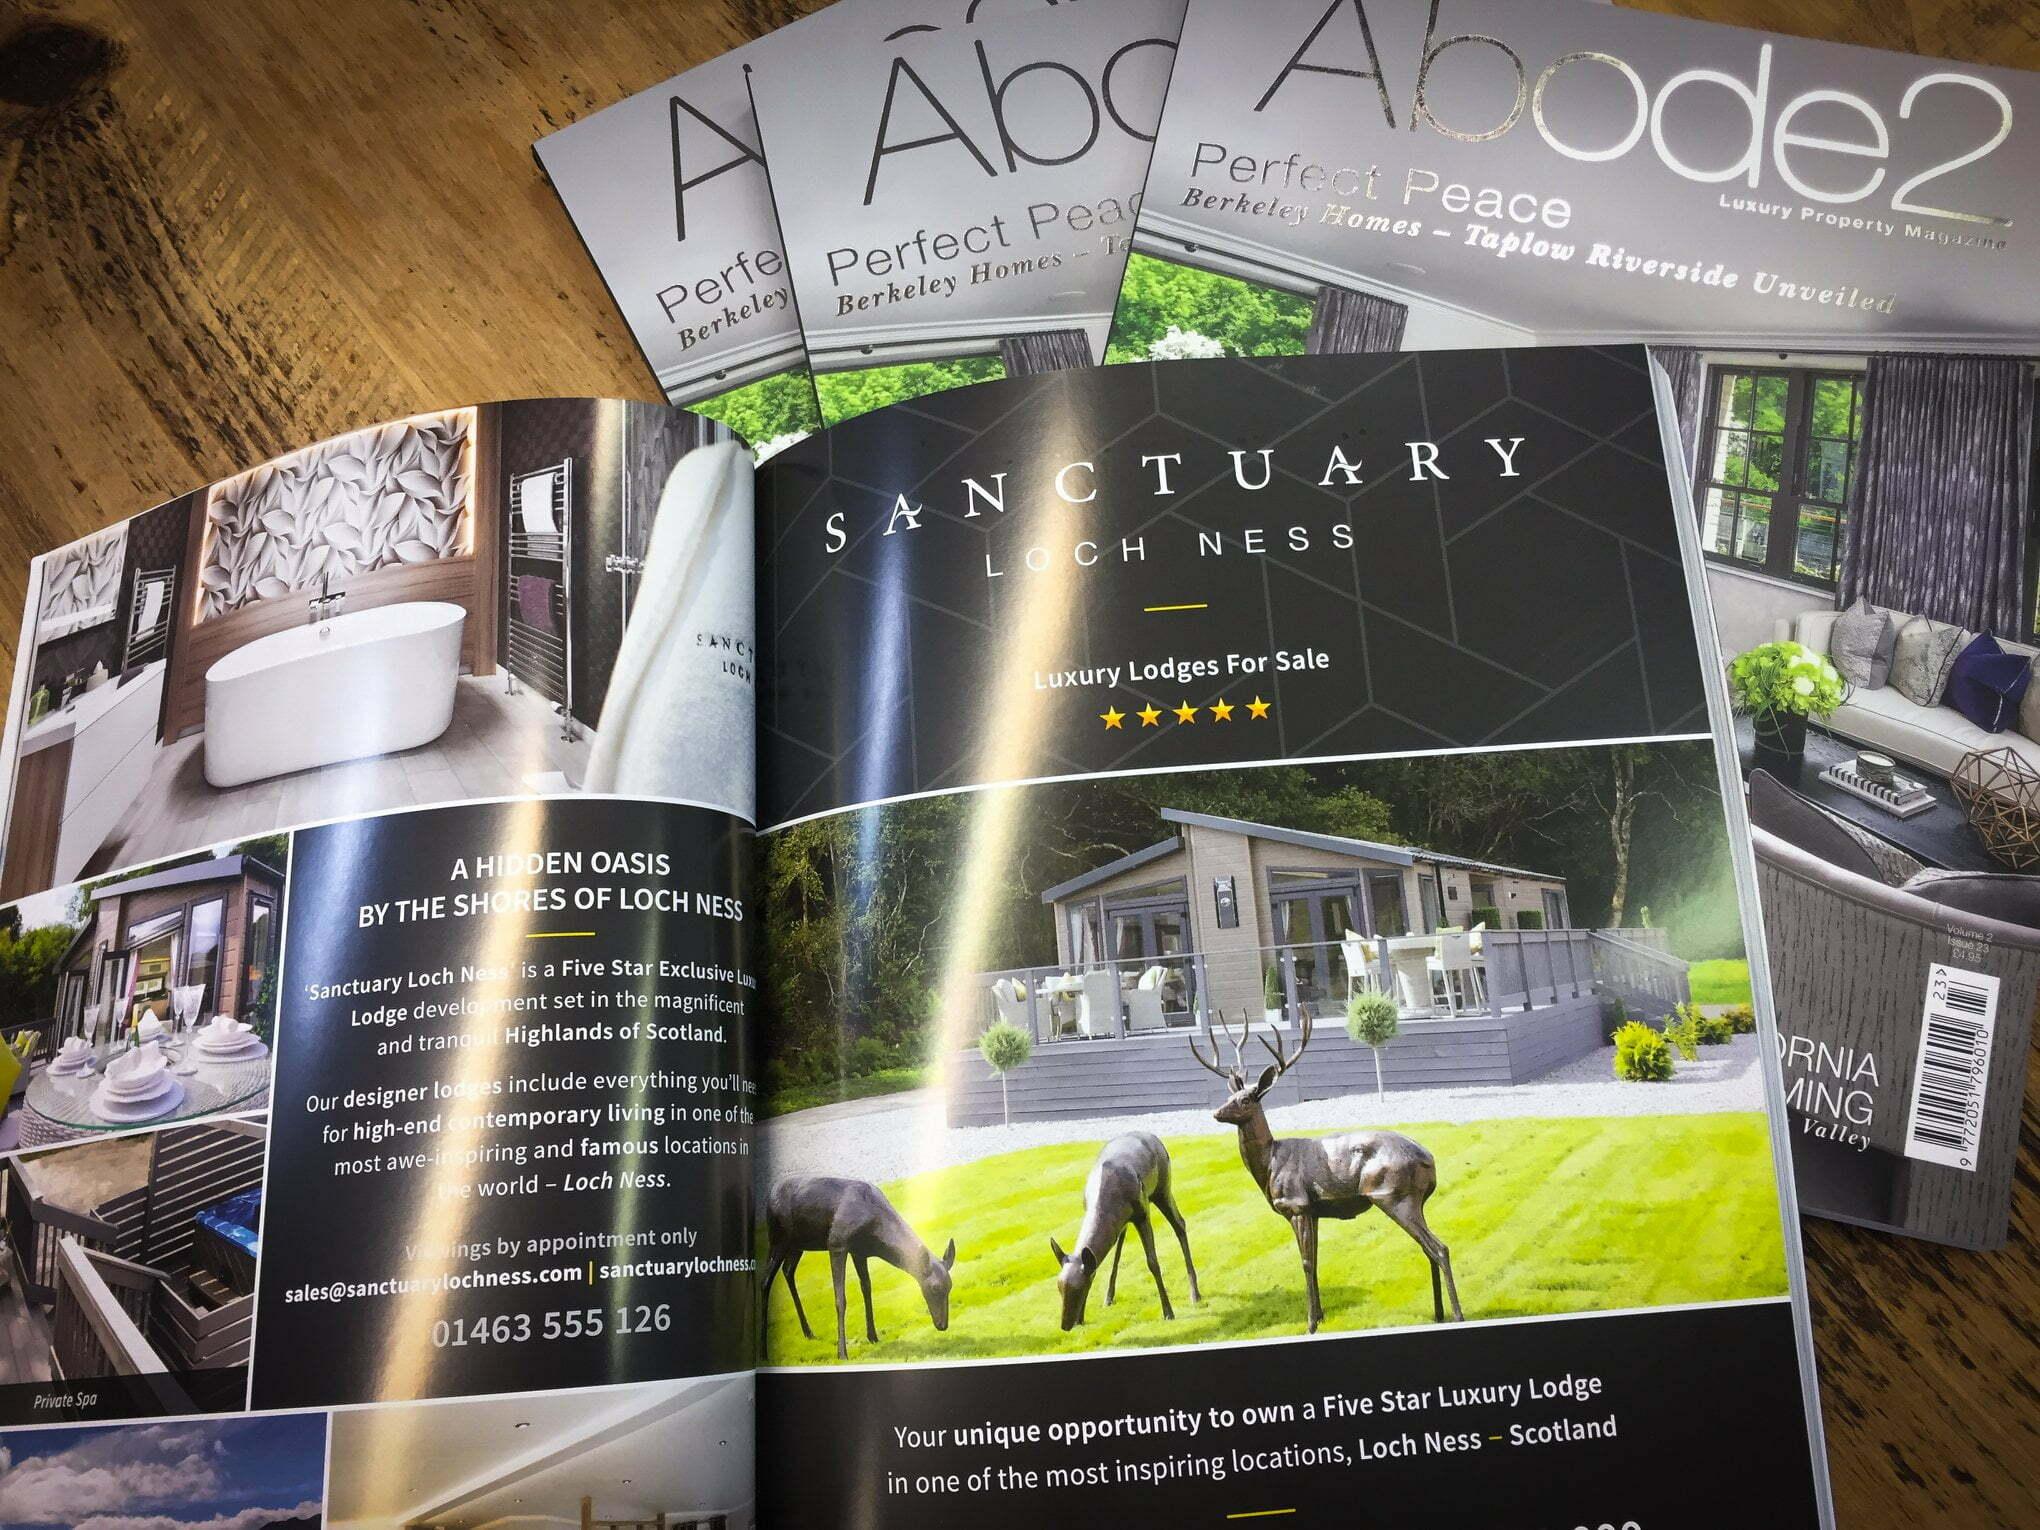 Magazine print advertising sanctuary loch ness